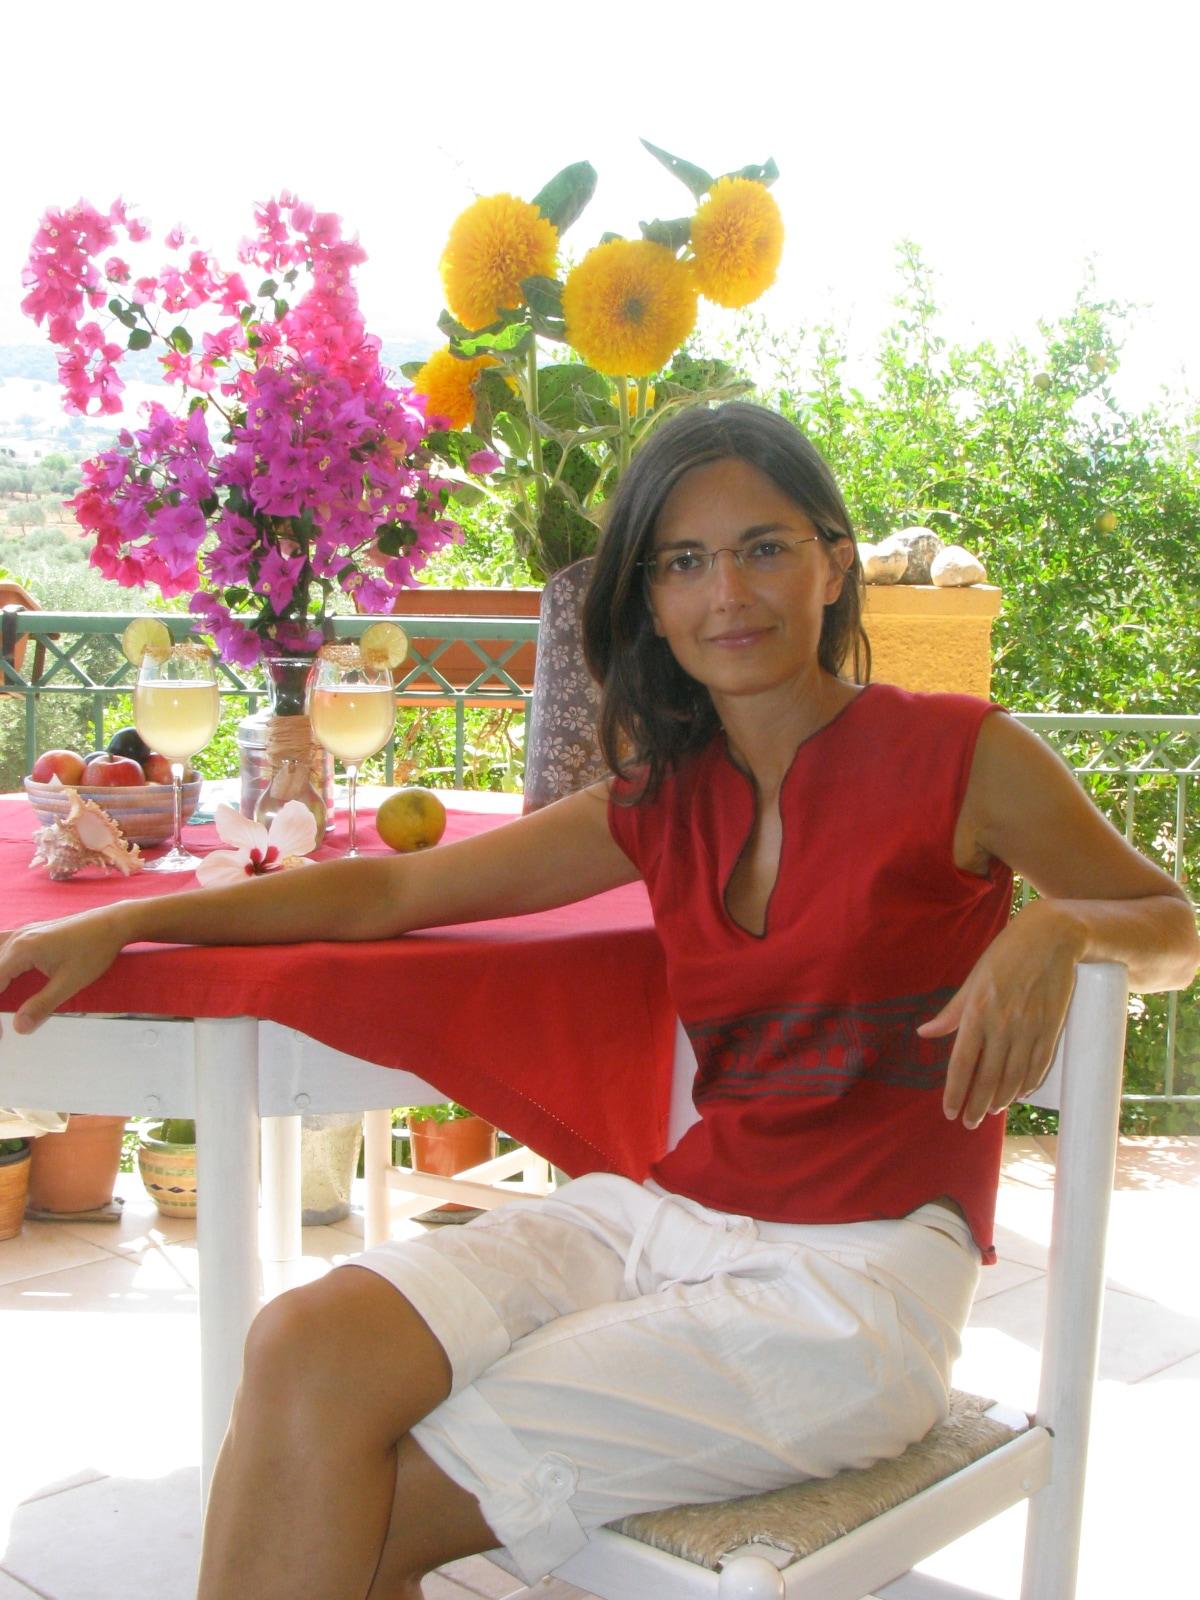 Marica from Alghero